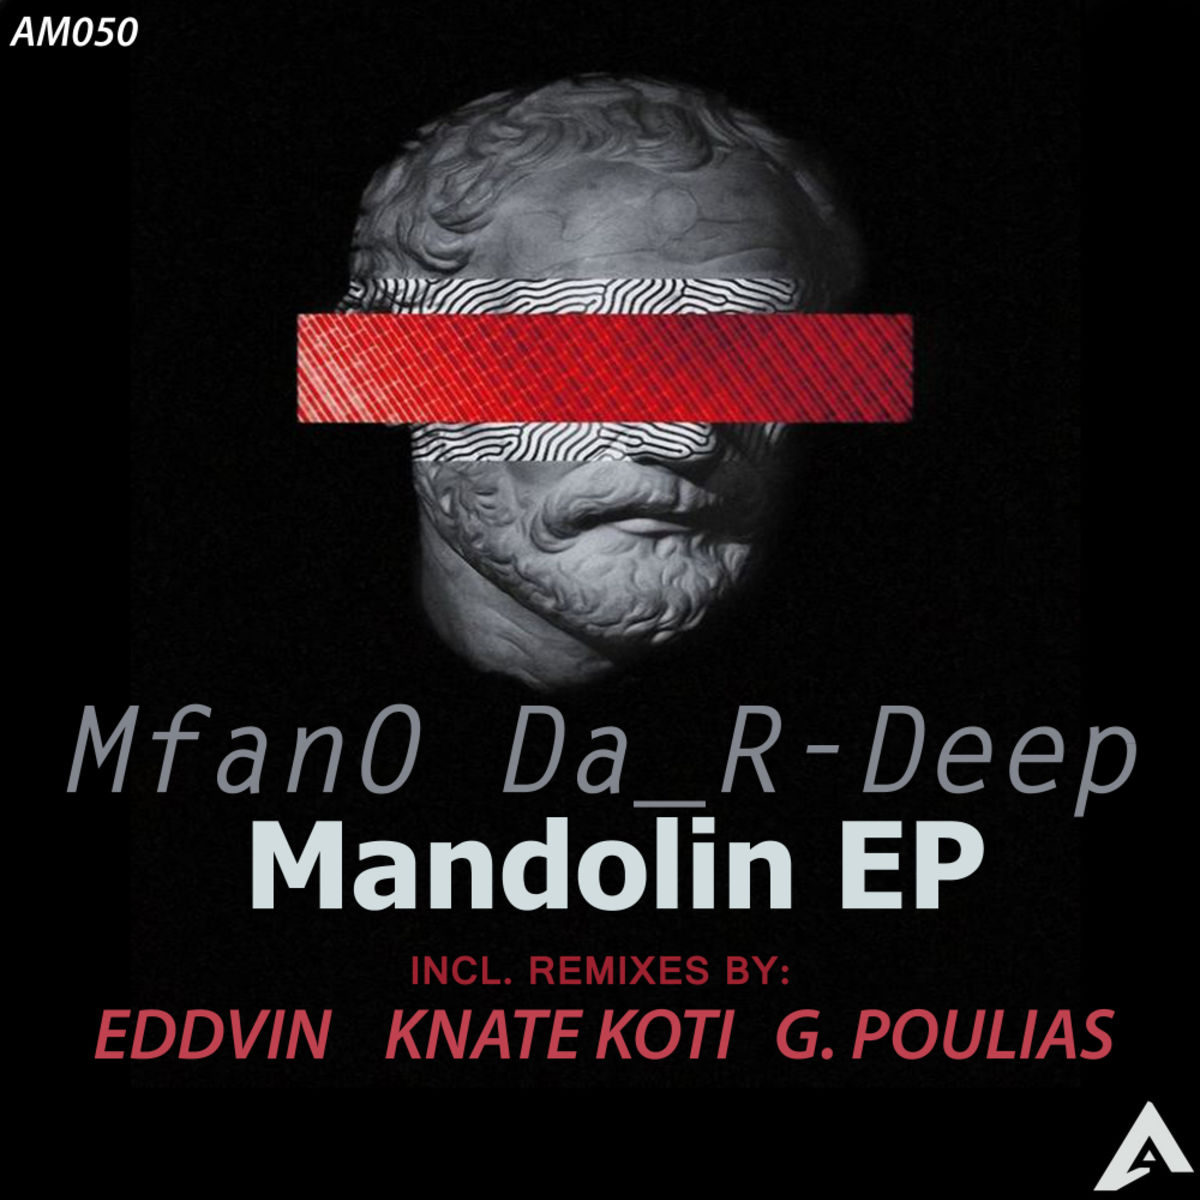 MfanO Da_R-Deep - Mandolin EP / AfroMove Music | Essential House